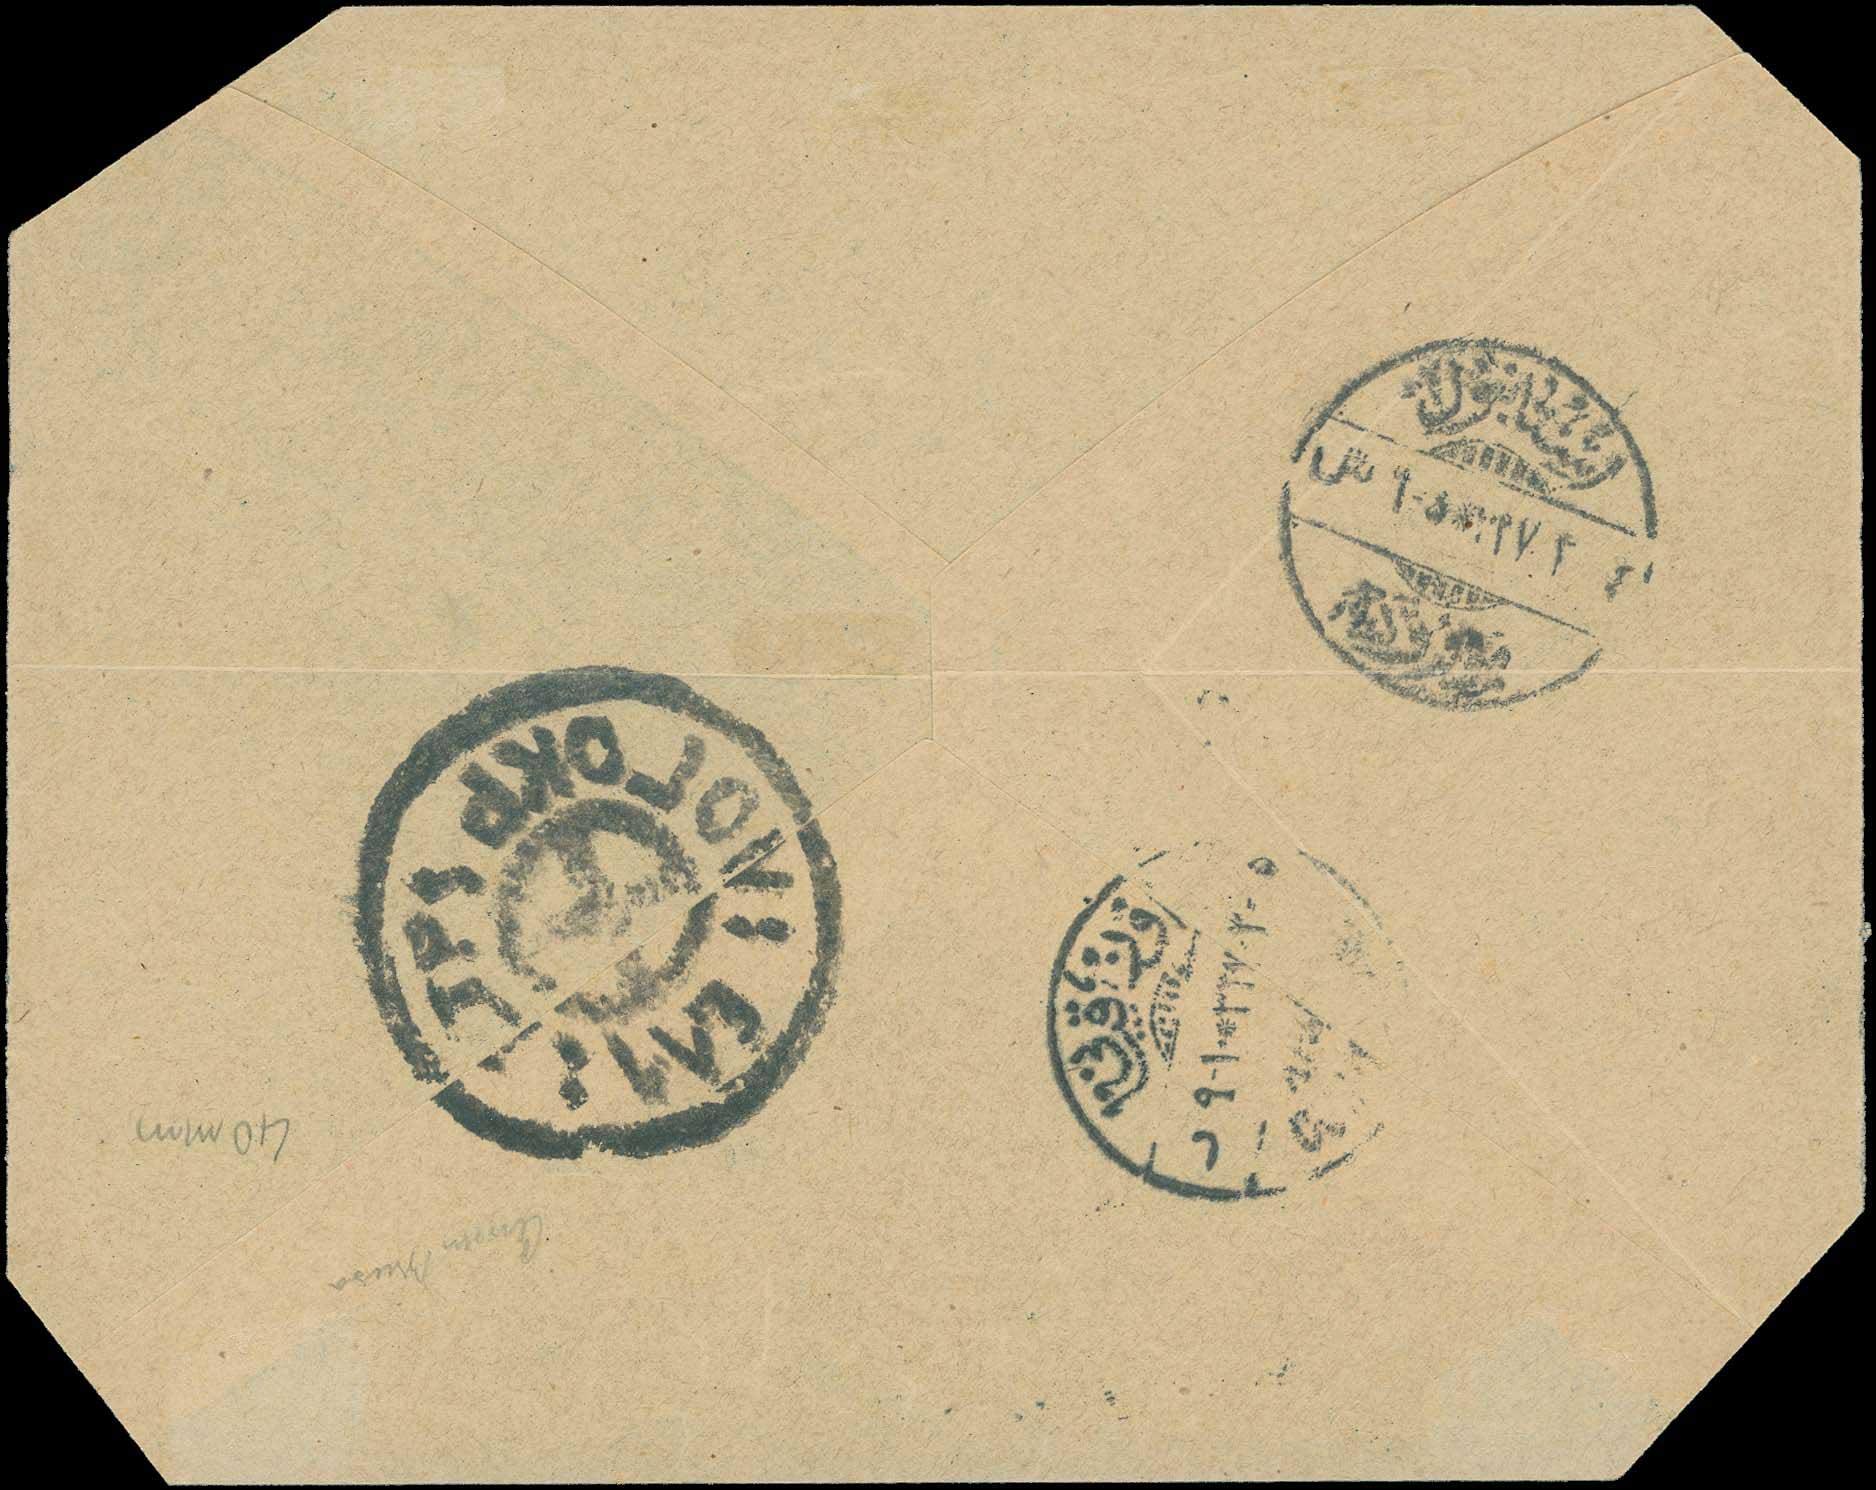 Lot 875 - -  SMYRNE,CONS/PLE & ASIA MINOR (before 1922) SMYRNE,CONS/PLE & ASIA MINOR (before 1922) -  A. Karamitsos Public & Live Internet Auction 675